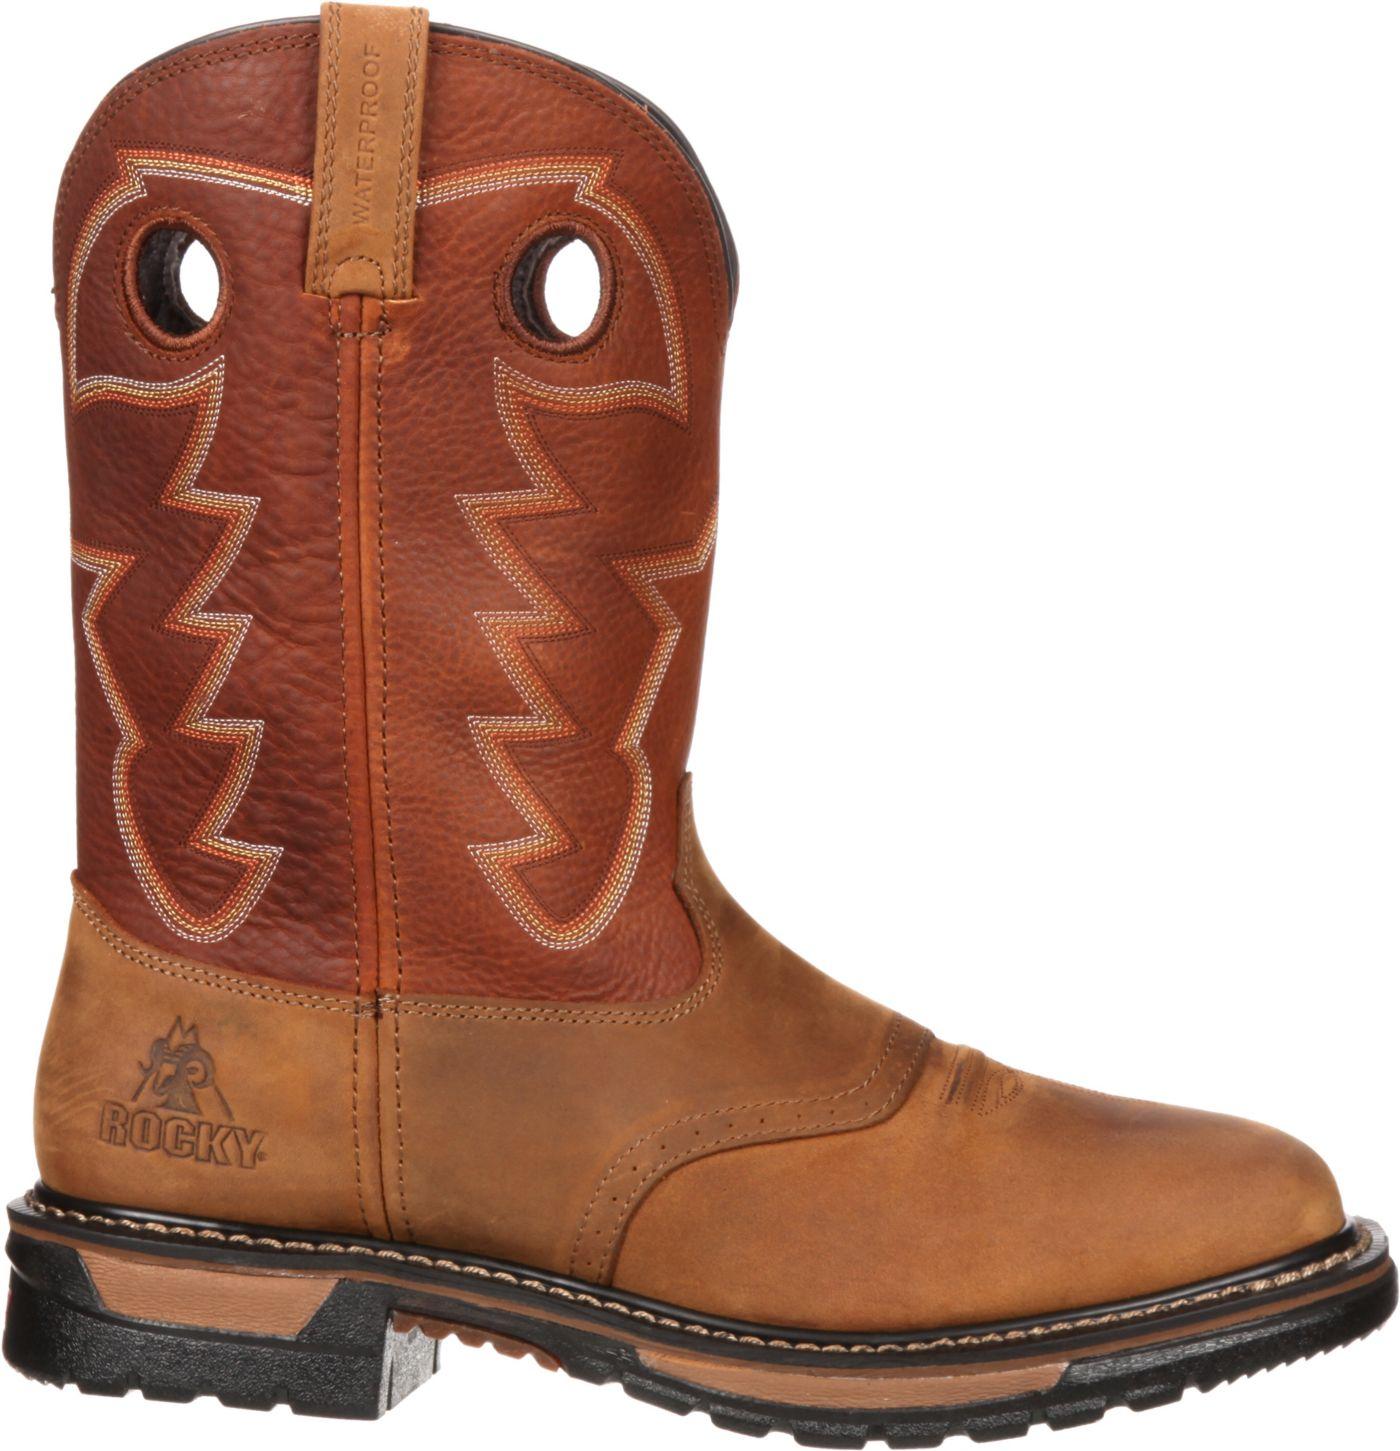 "Rocky Men's Original Ride 11"" Waterproof Western Boots"